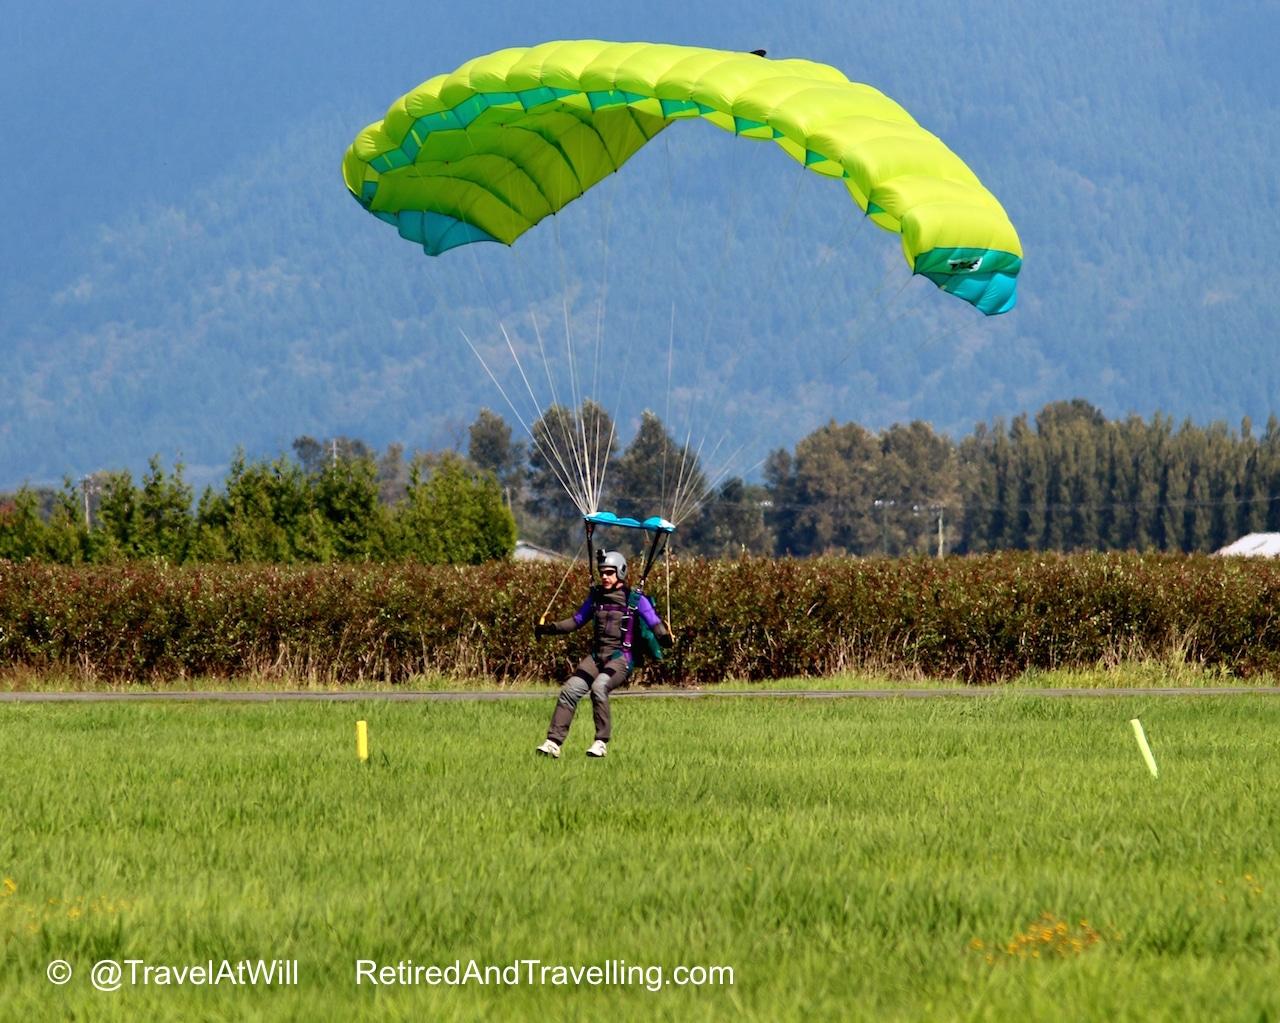 Skydivers Land - Skydiving In The Rear View Mirror.jpg